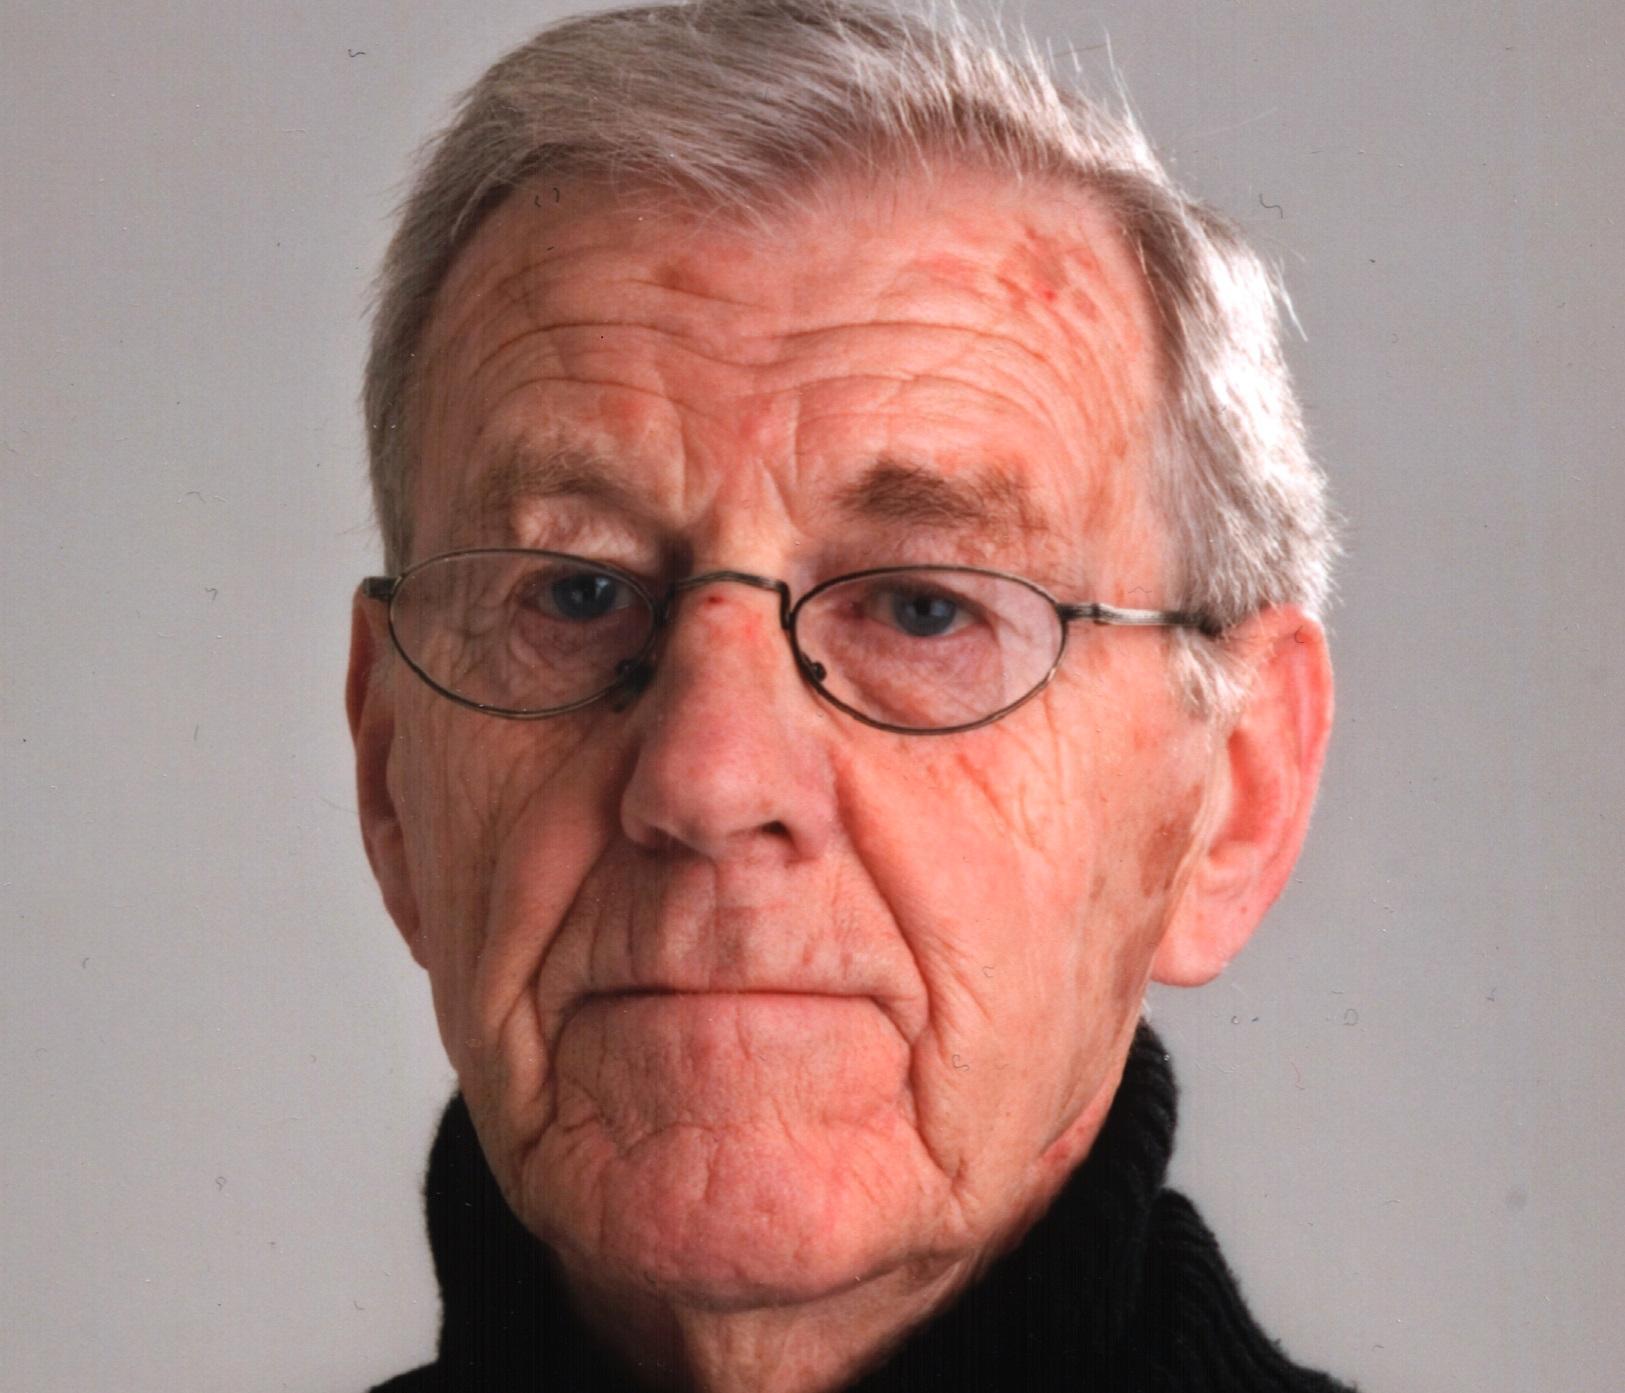 Håkon C. Pedersen